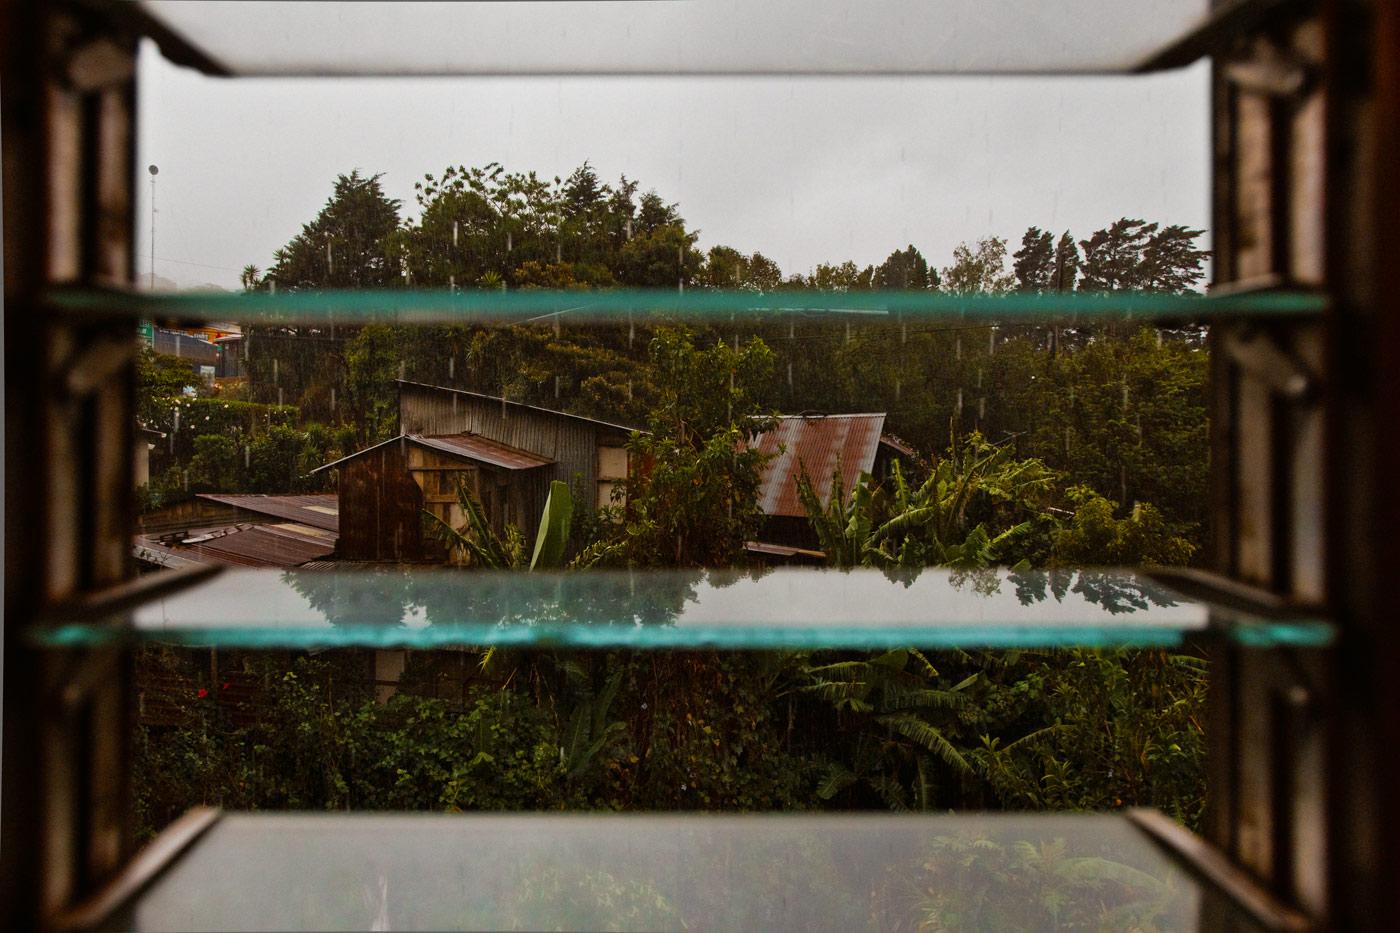 Nick-Zantop-Photography-Rainforest-5